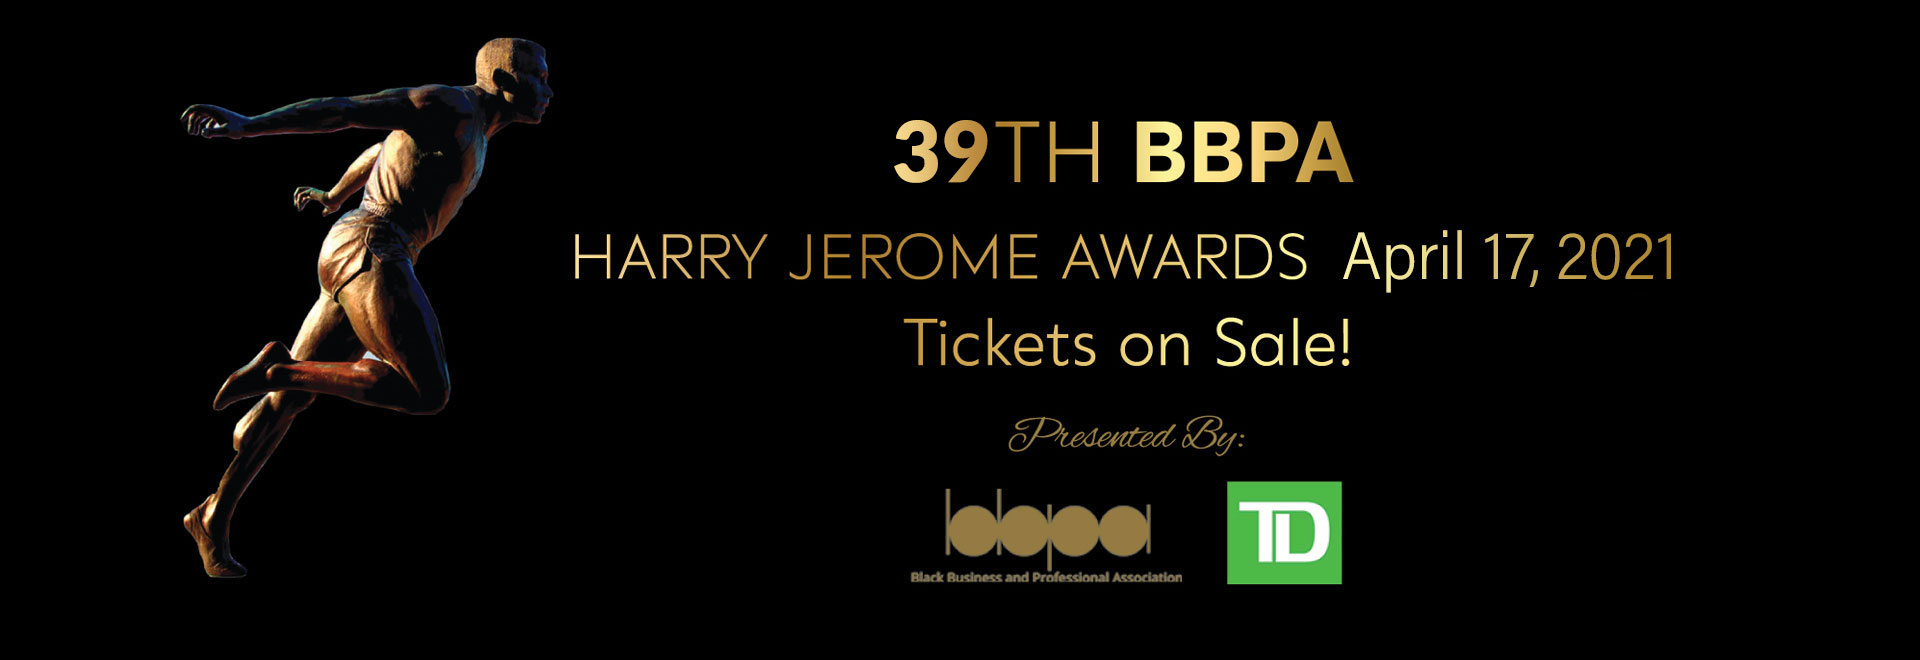 38th-bbpa-hja-awards-slide